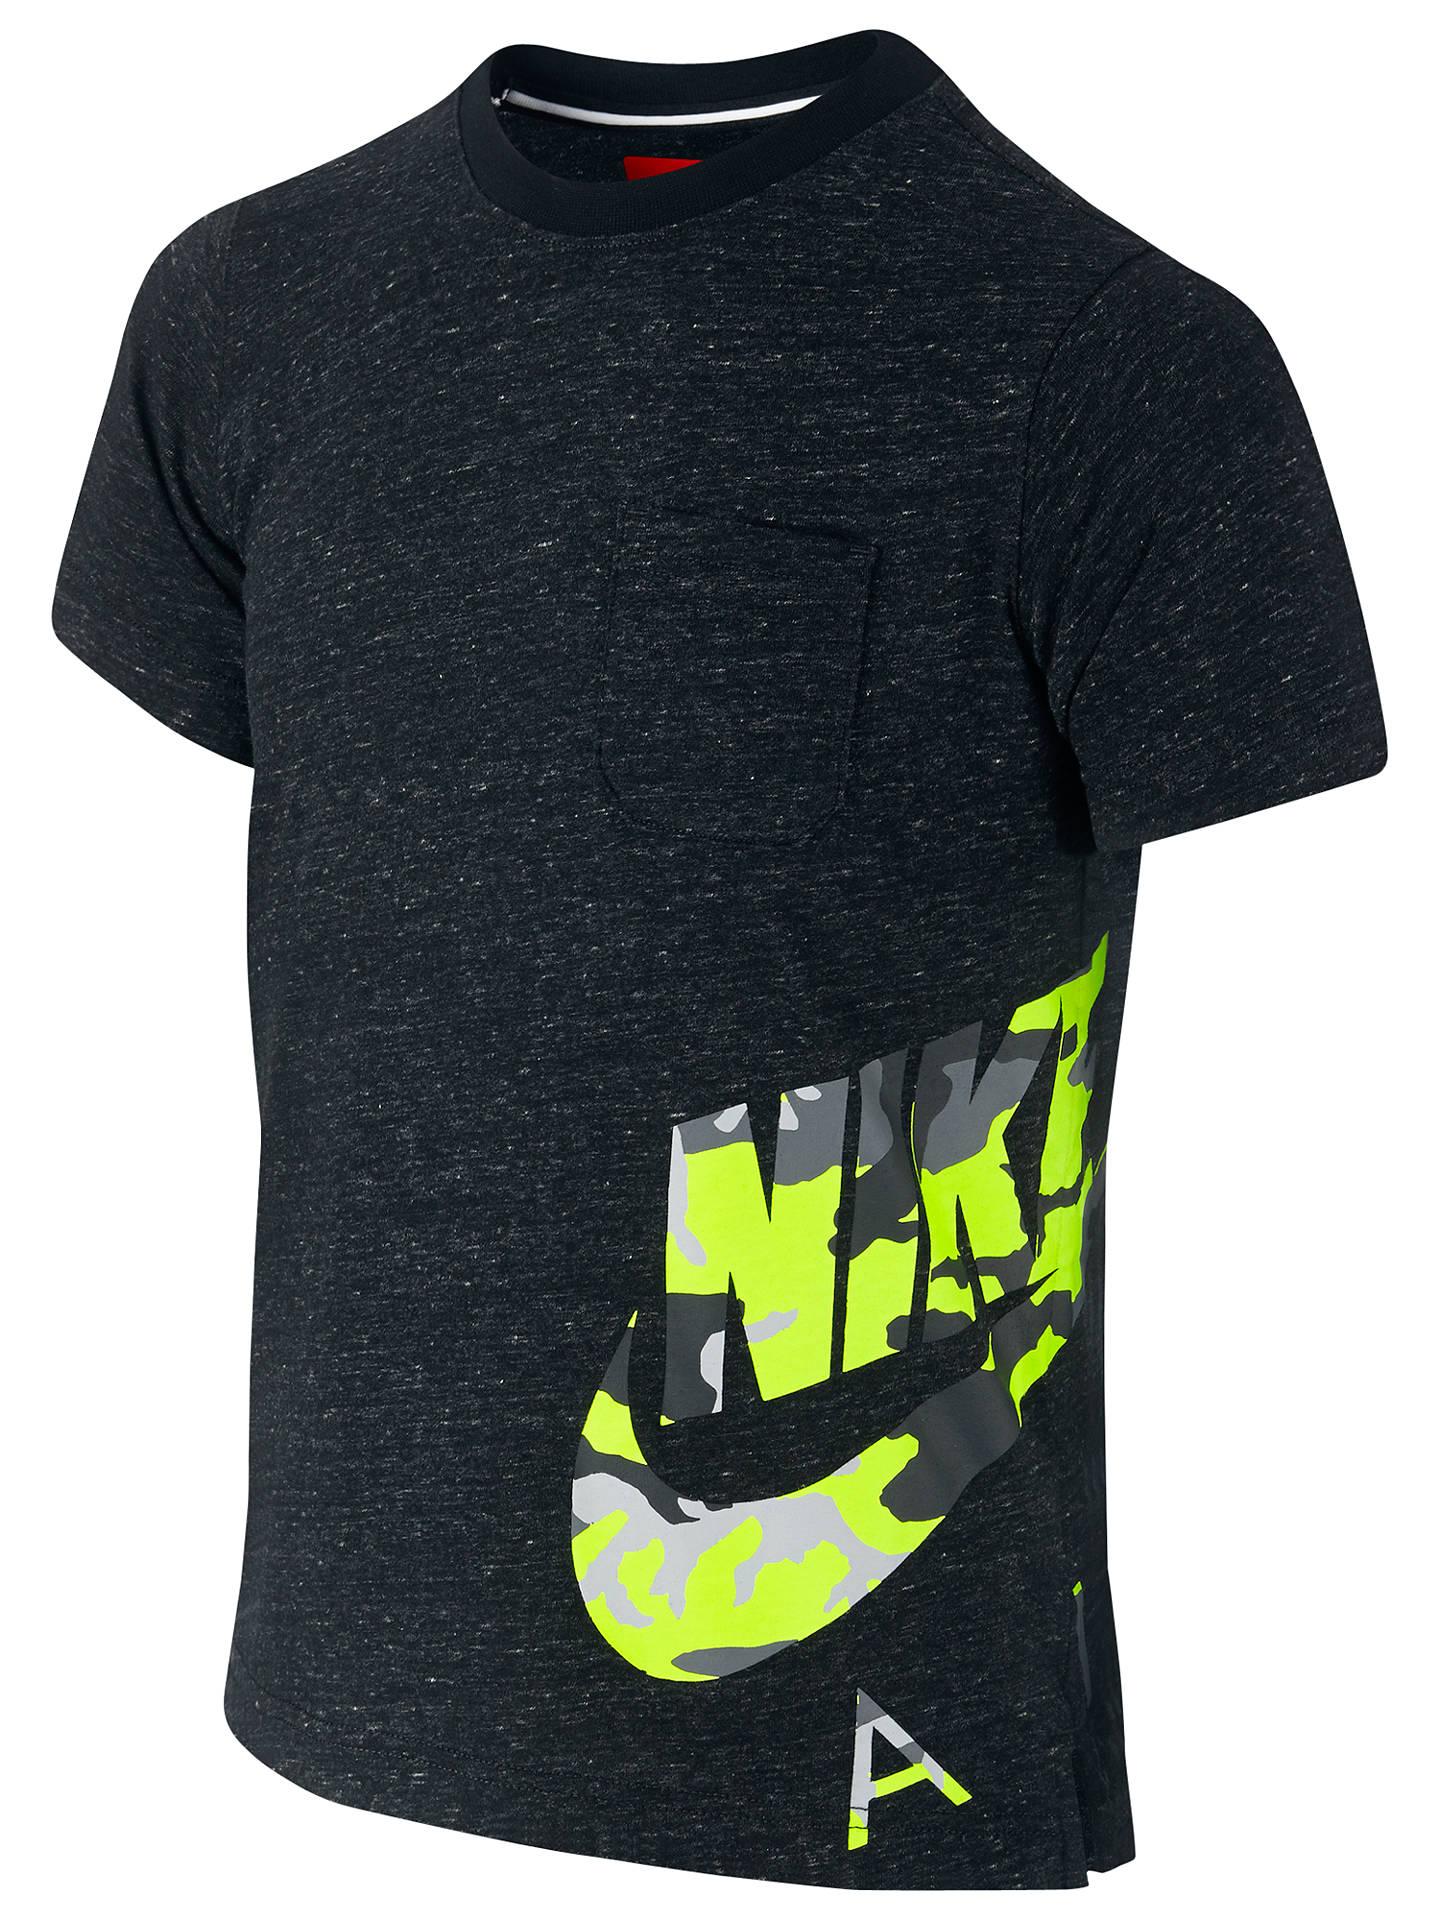 6d8feb2ba Nike Boys' Camo Pocket Short Sleeve T-Shirt | Black at John Lewis ...